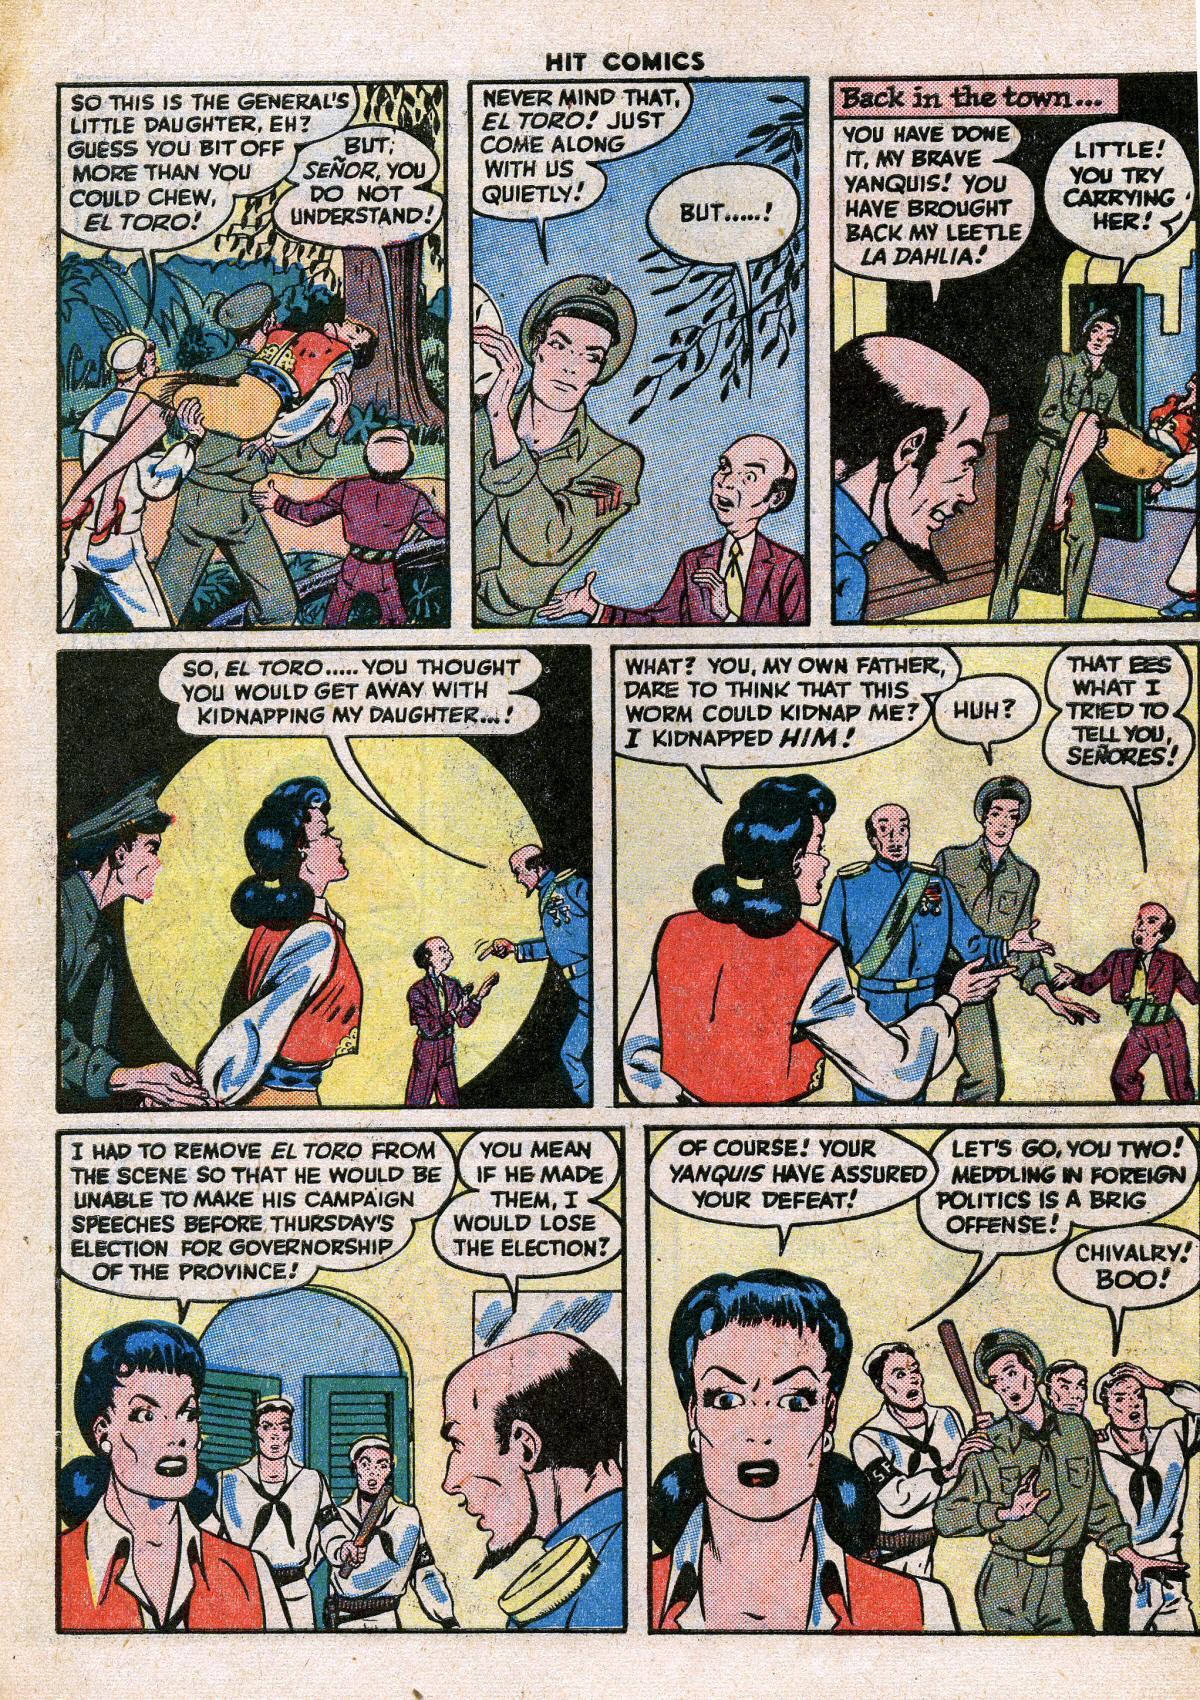 Read online Hit Comics comic -  Issue #41 - 50